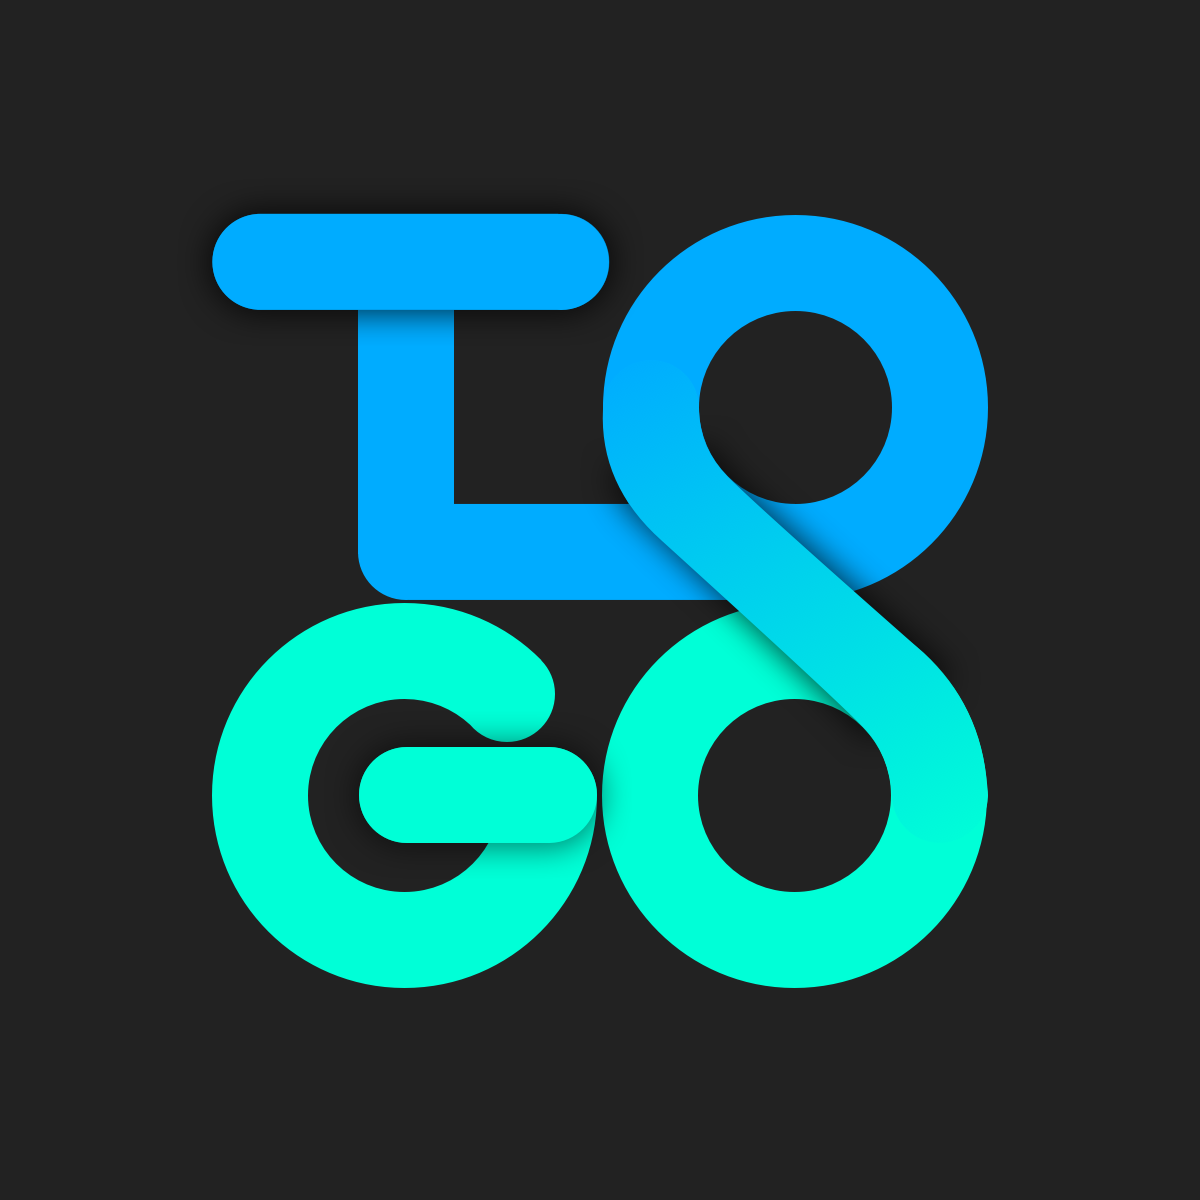 Разработать логотип и экран загрузки приложения фото f_1335a87296905465.png